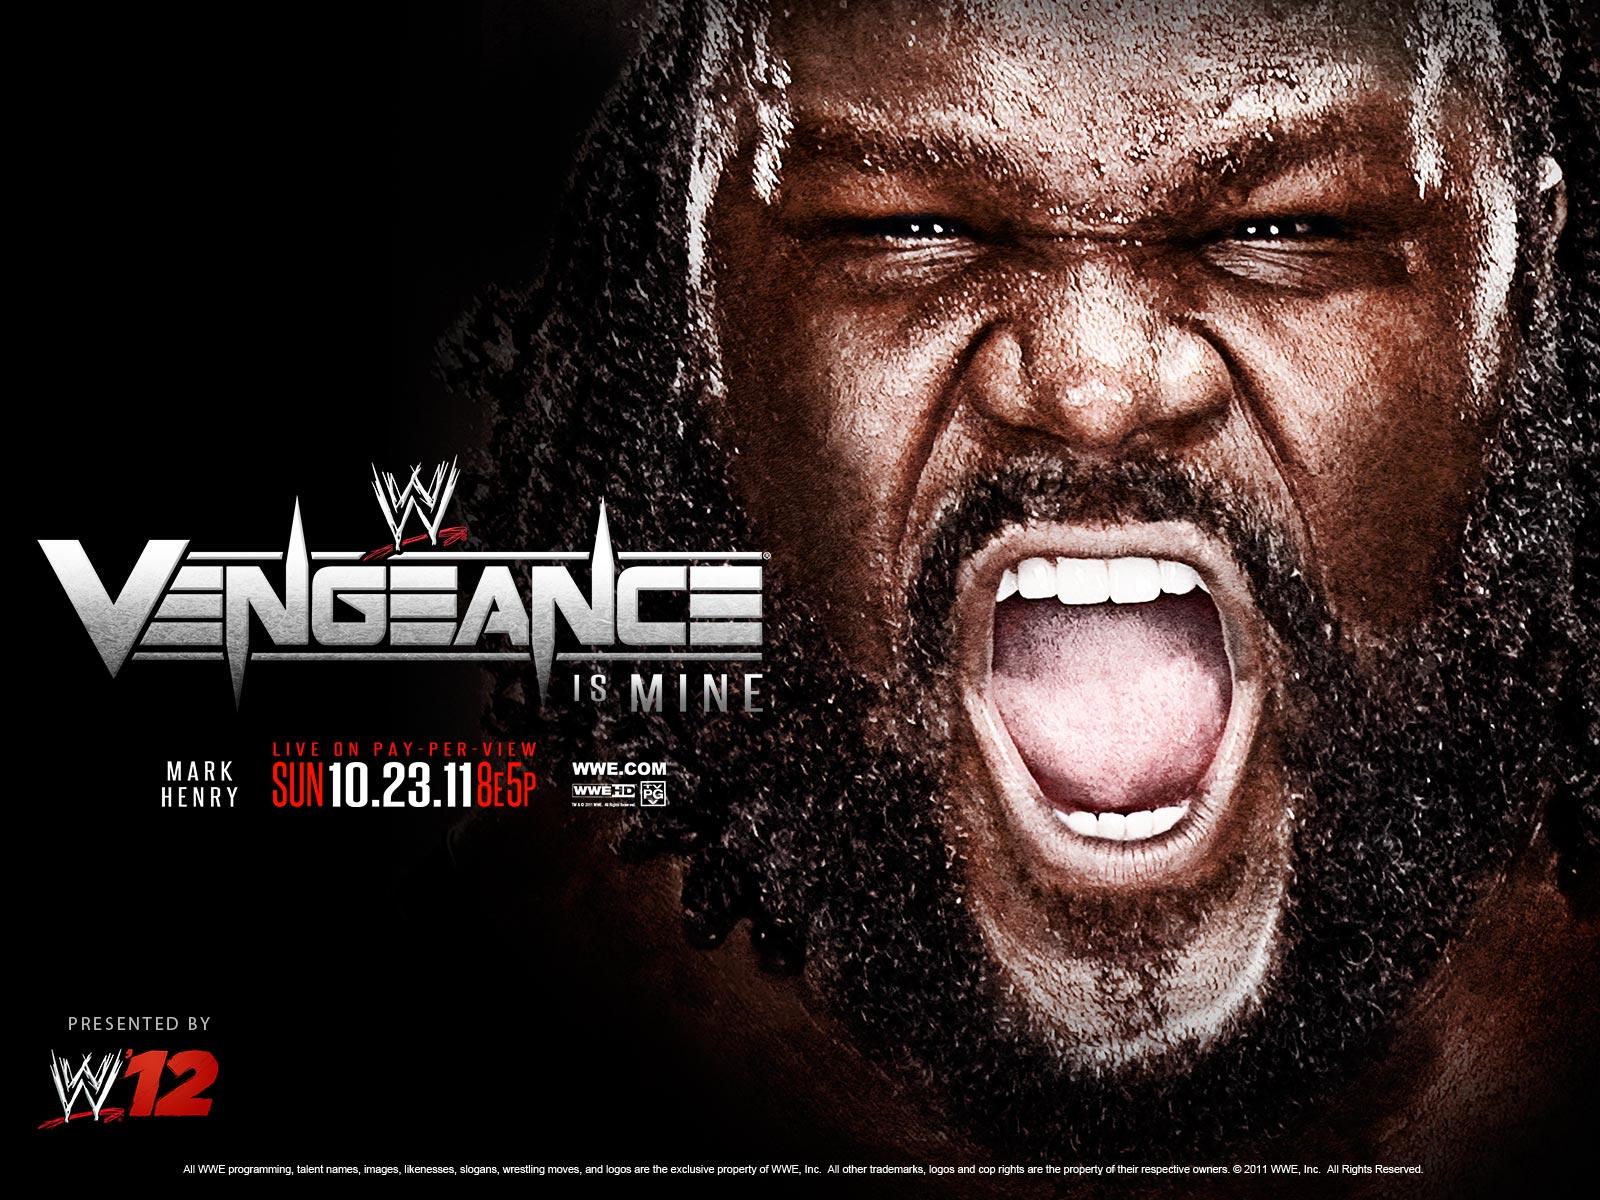 http://3.bp.blogspot.com/-2nYpGm2kSCU/TqLYZBXIQNI/AAAAAAAAAKQ/tONGB285uW0/s1600/WWE-Vengeance-2011-Official-Wallpaper.jpg